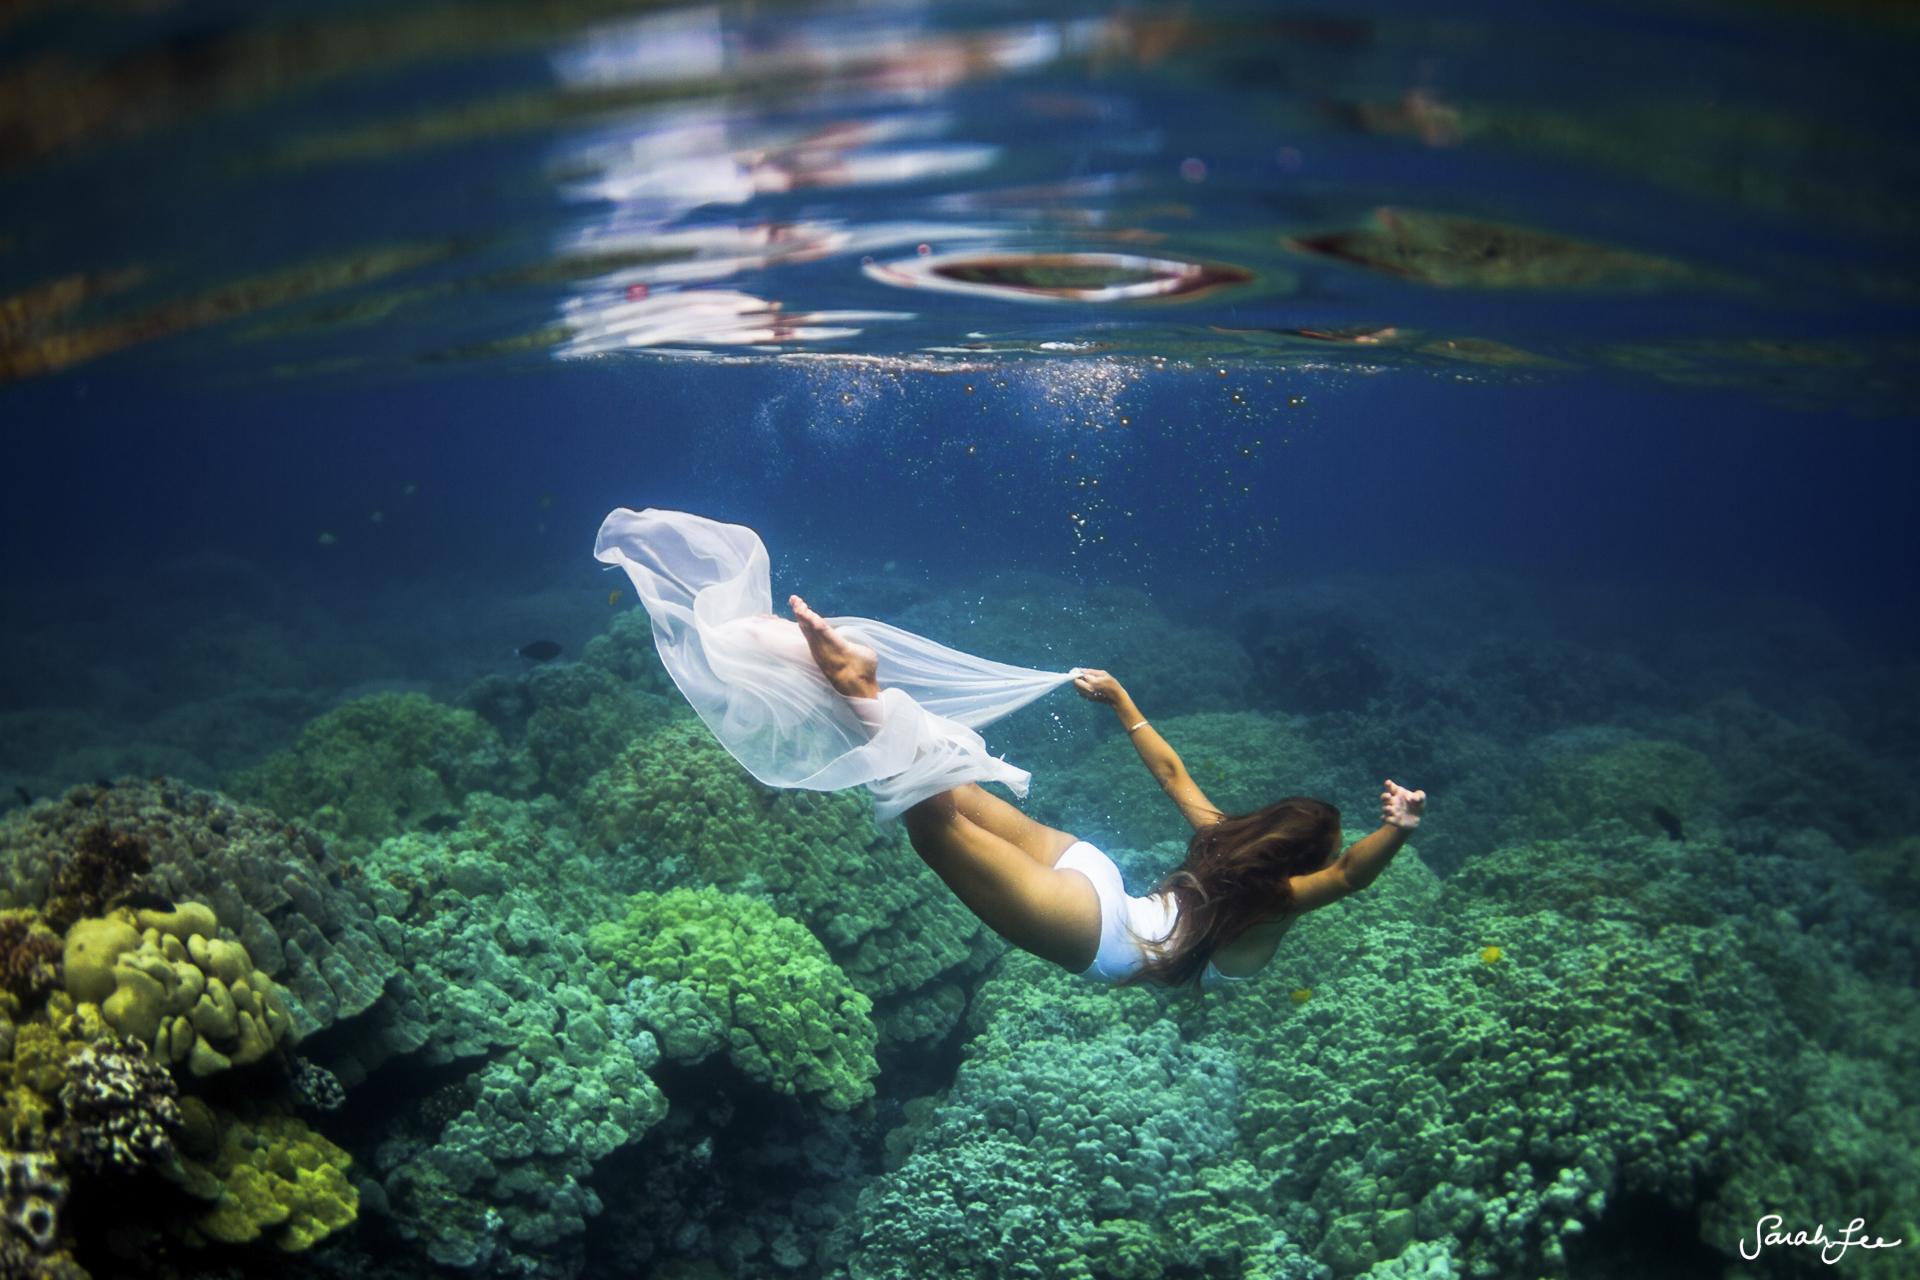 028_Sarah_Lee_Photography_Underwater_.jpg